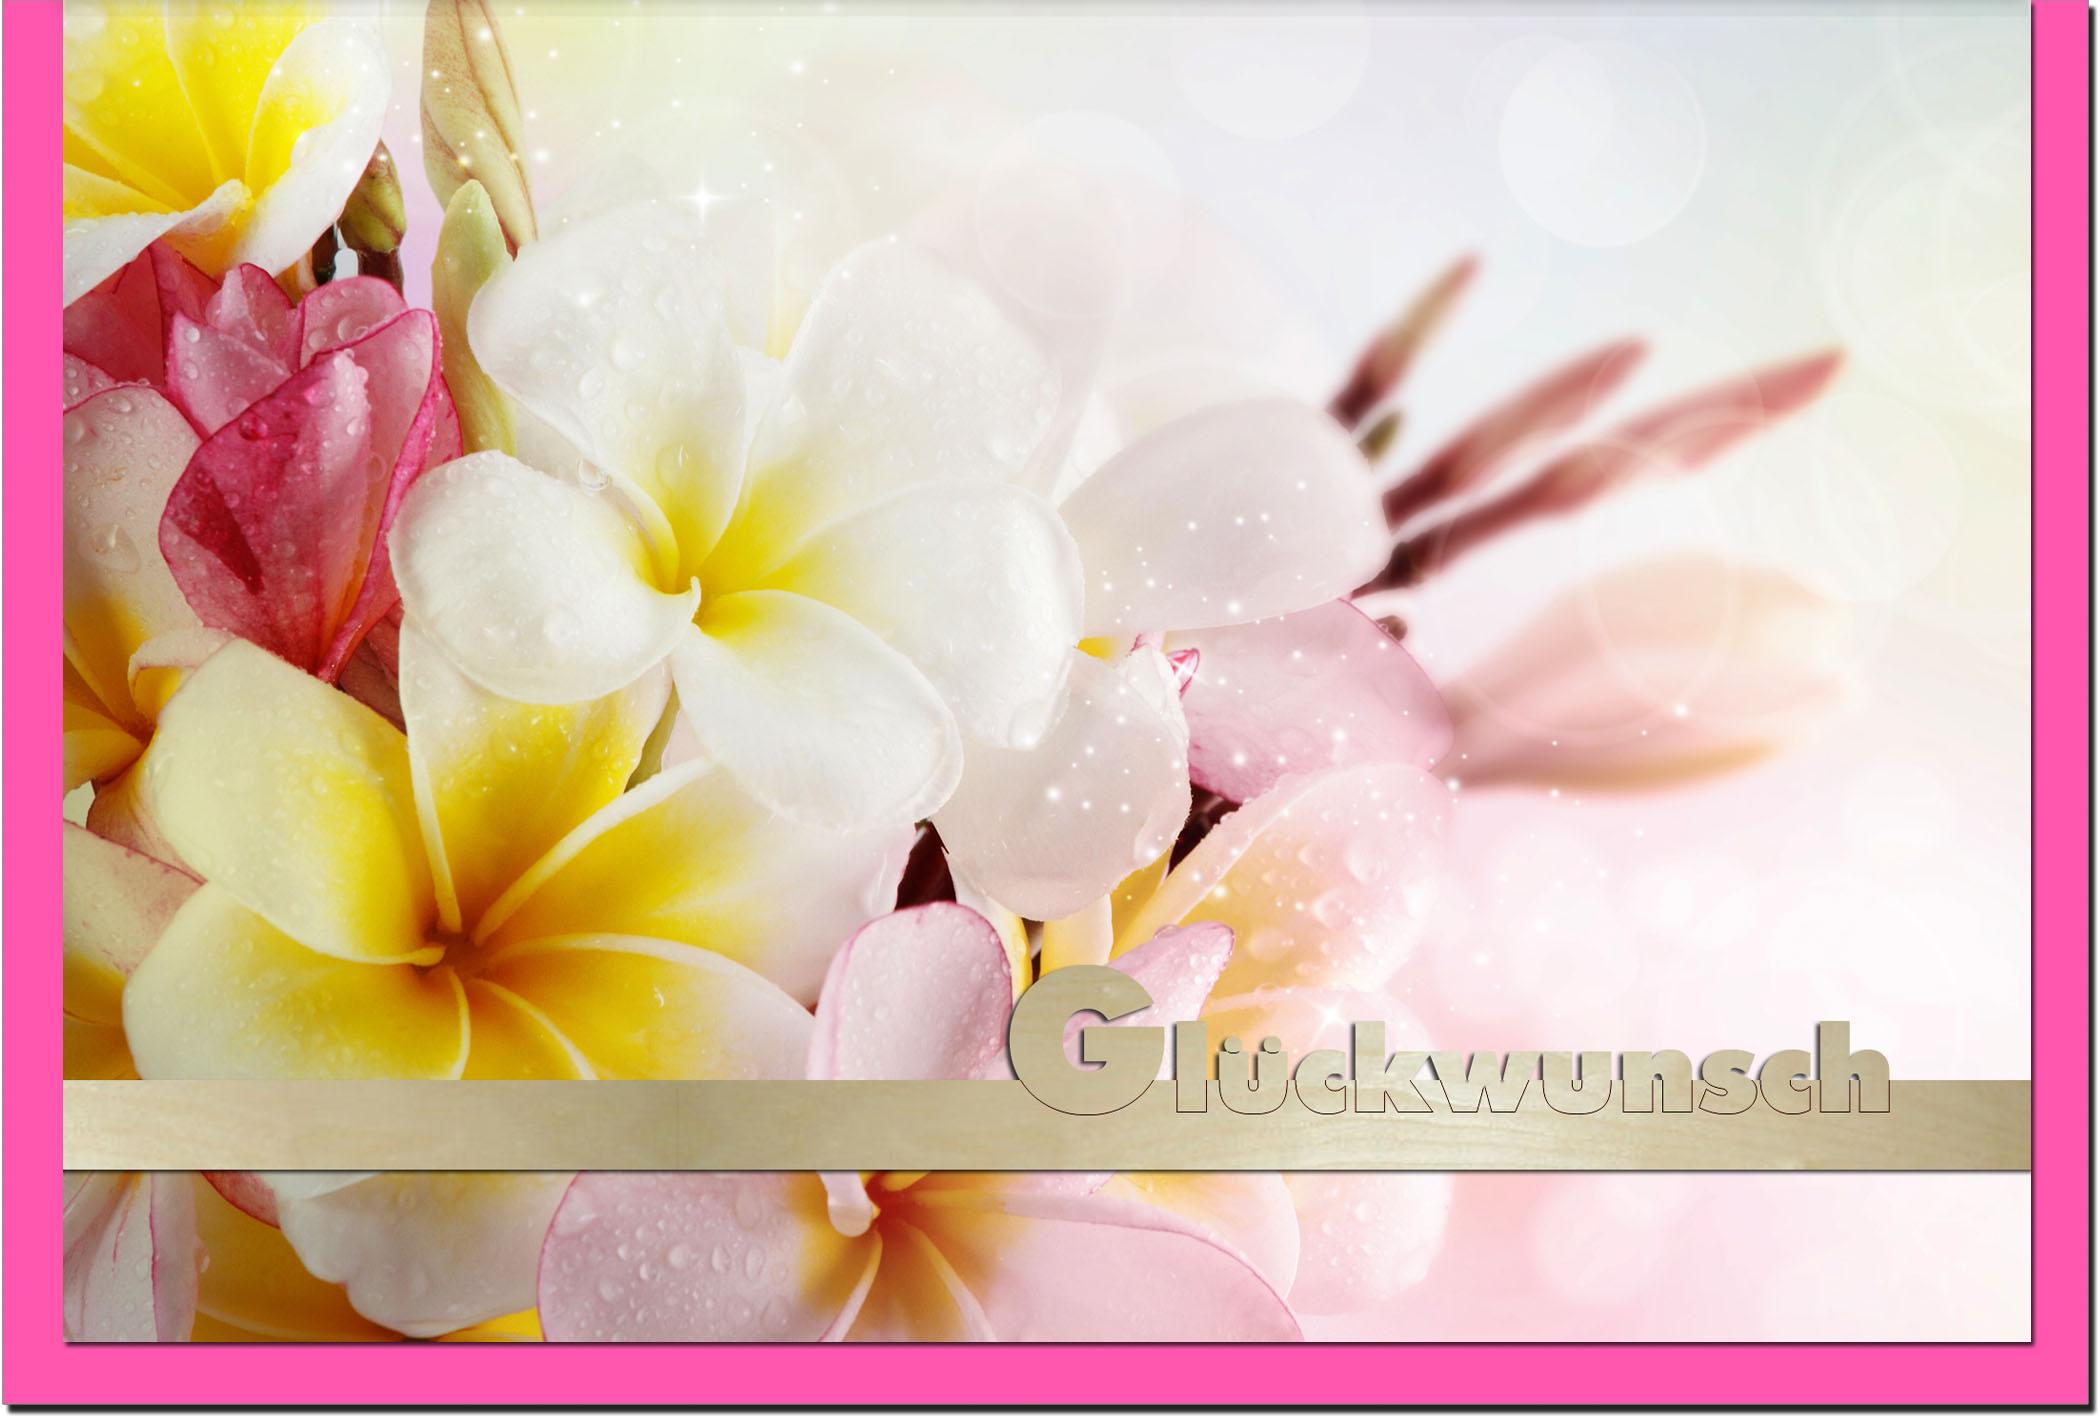 Glückwunschkarten Grußkarten Glückwunsch Blumen